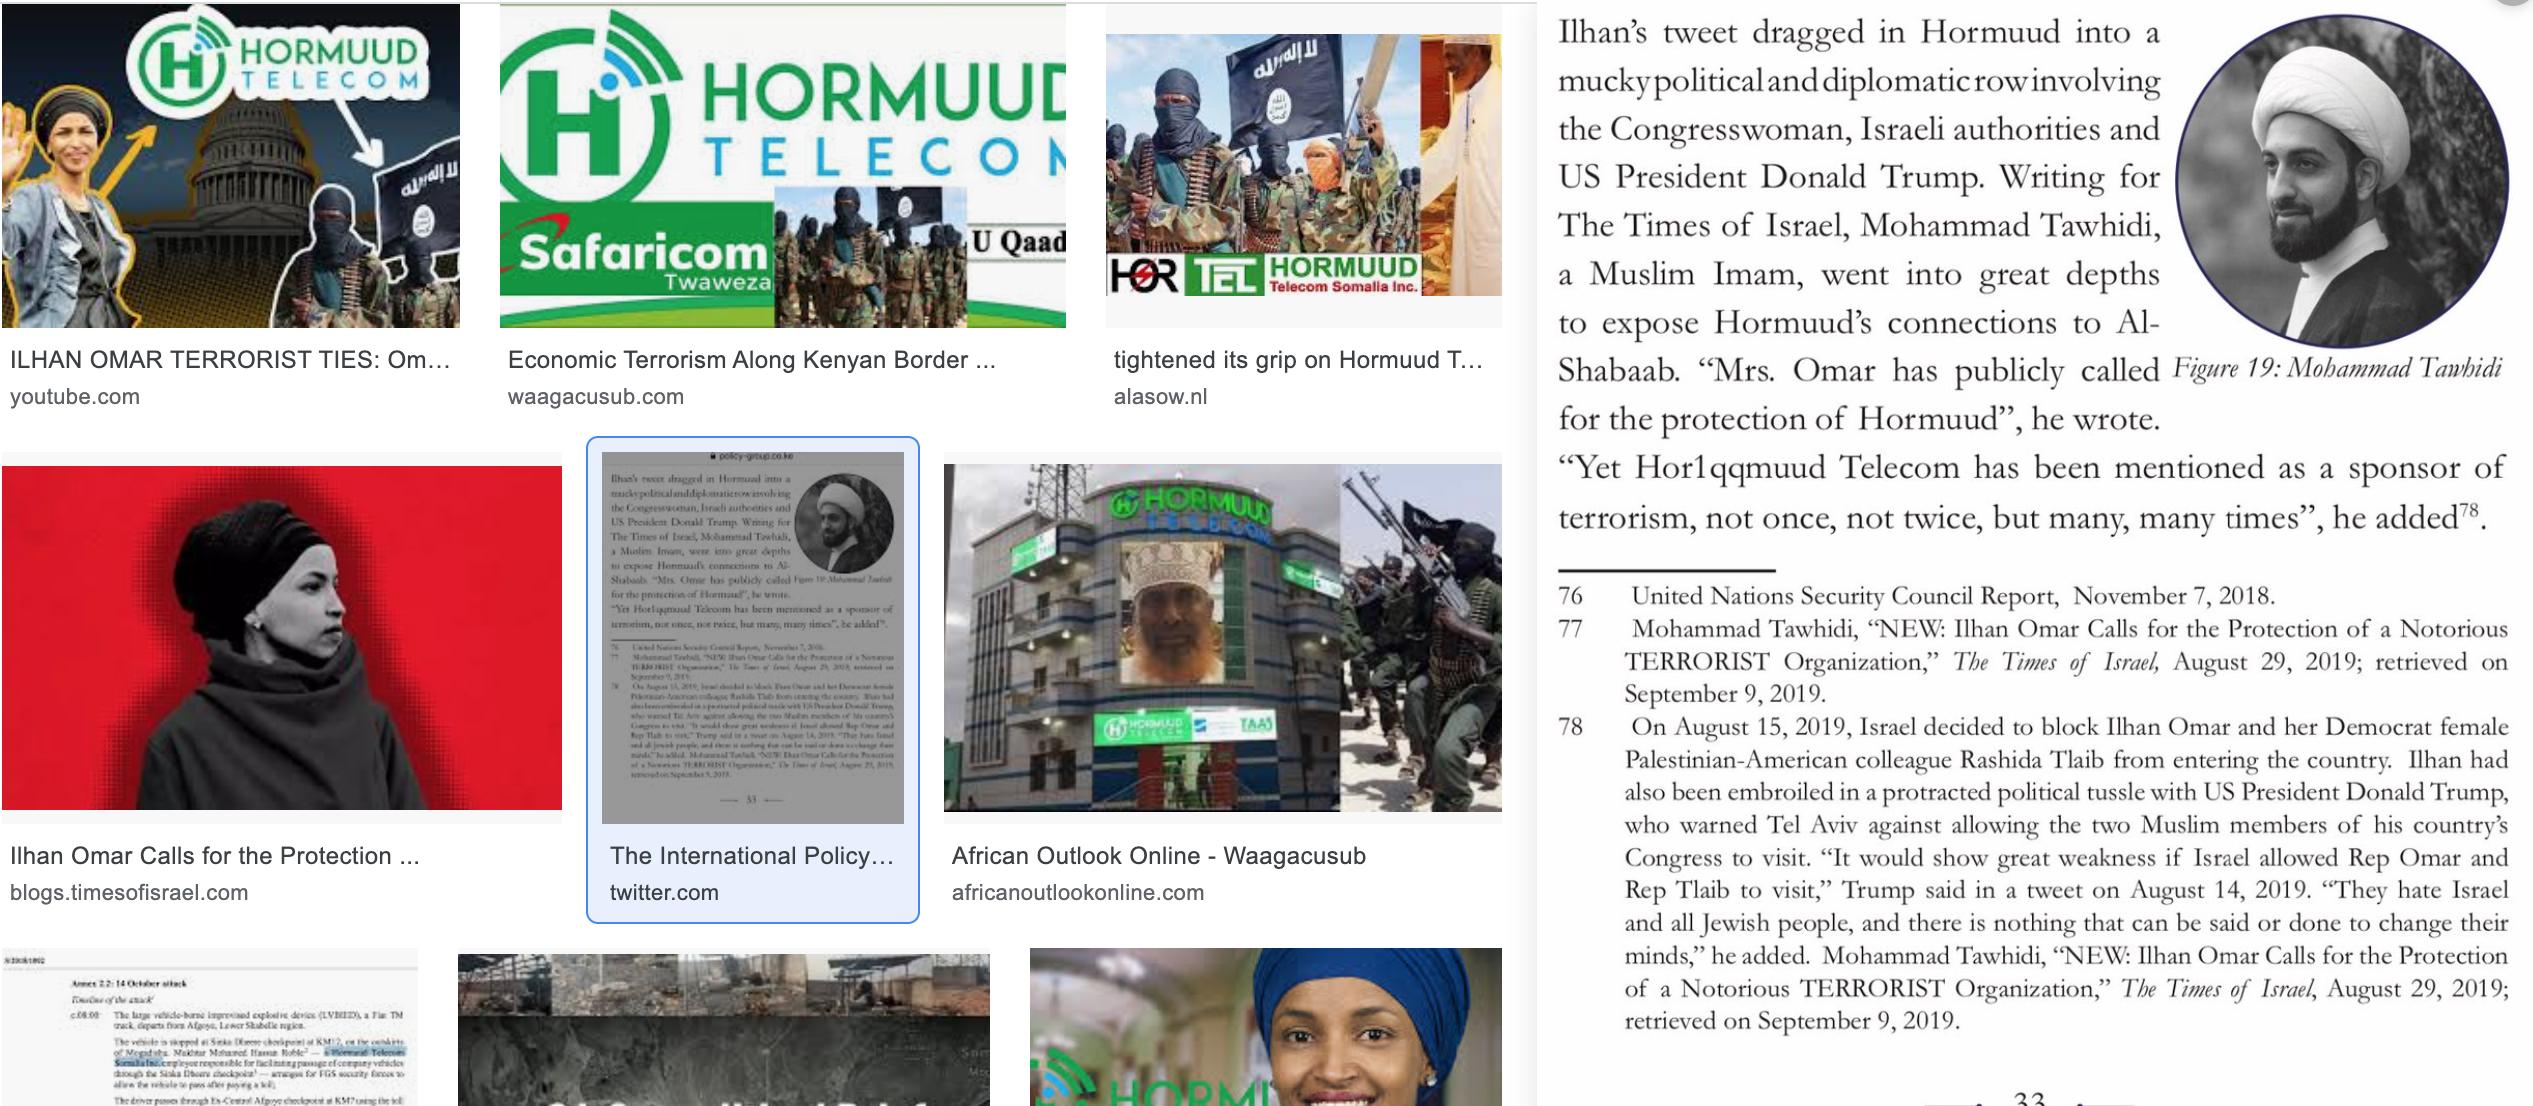 Somalia:Hormuud's Communication Warfare +Terrorism